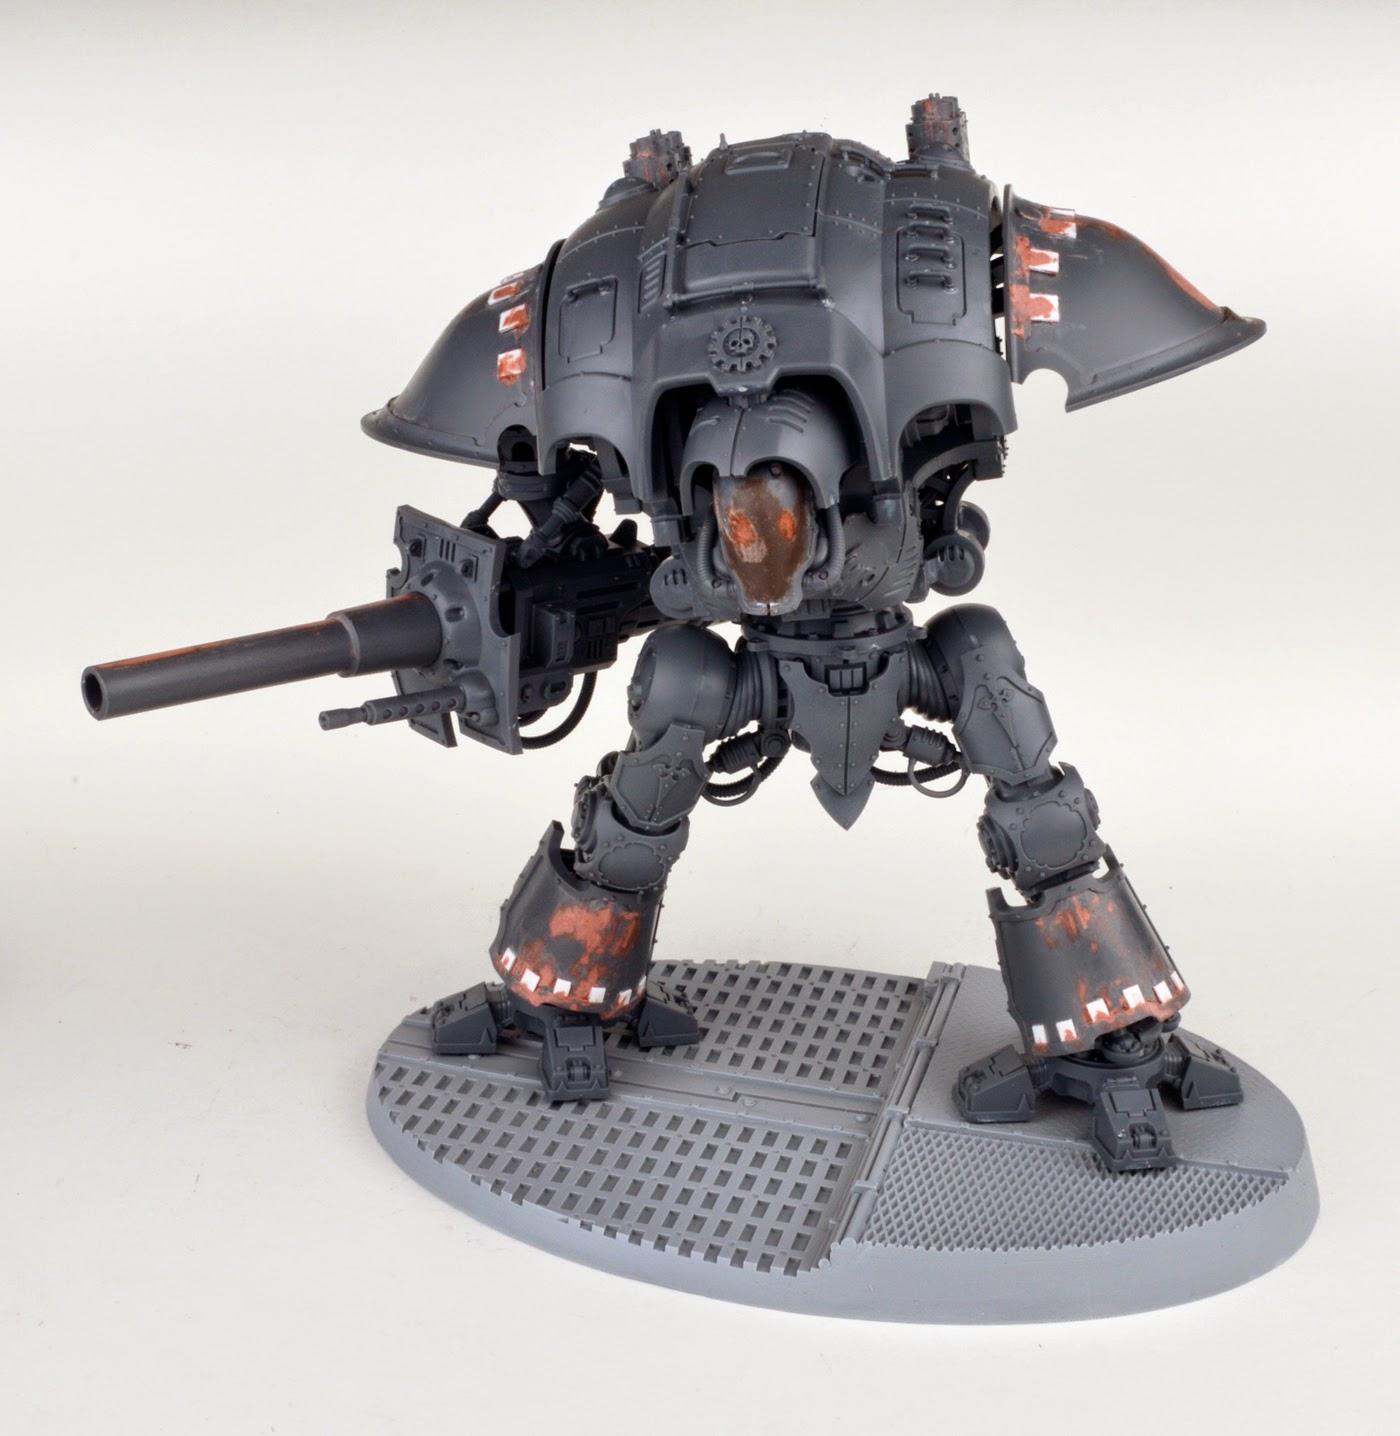 Mechanicum - A Knight Paladin on deck